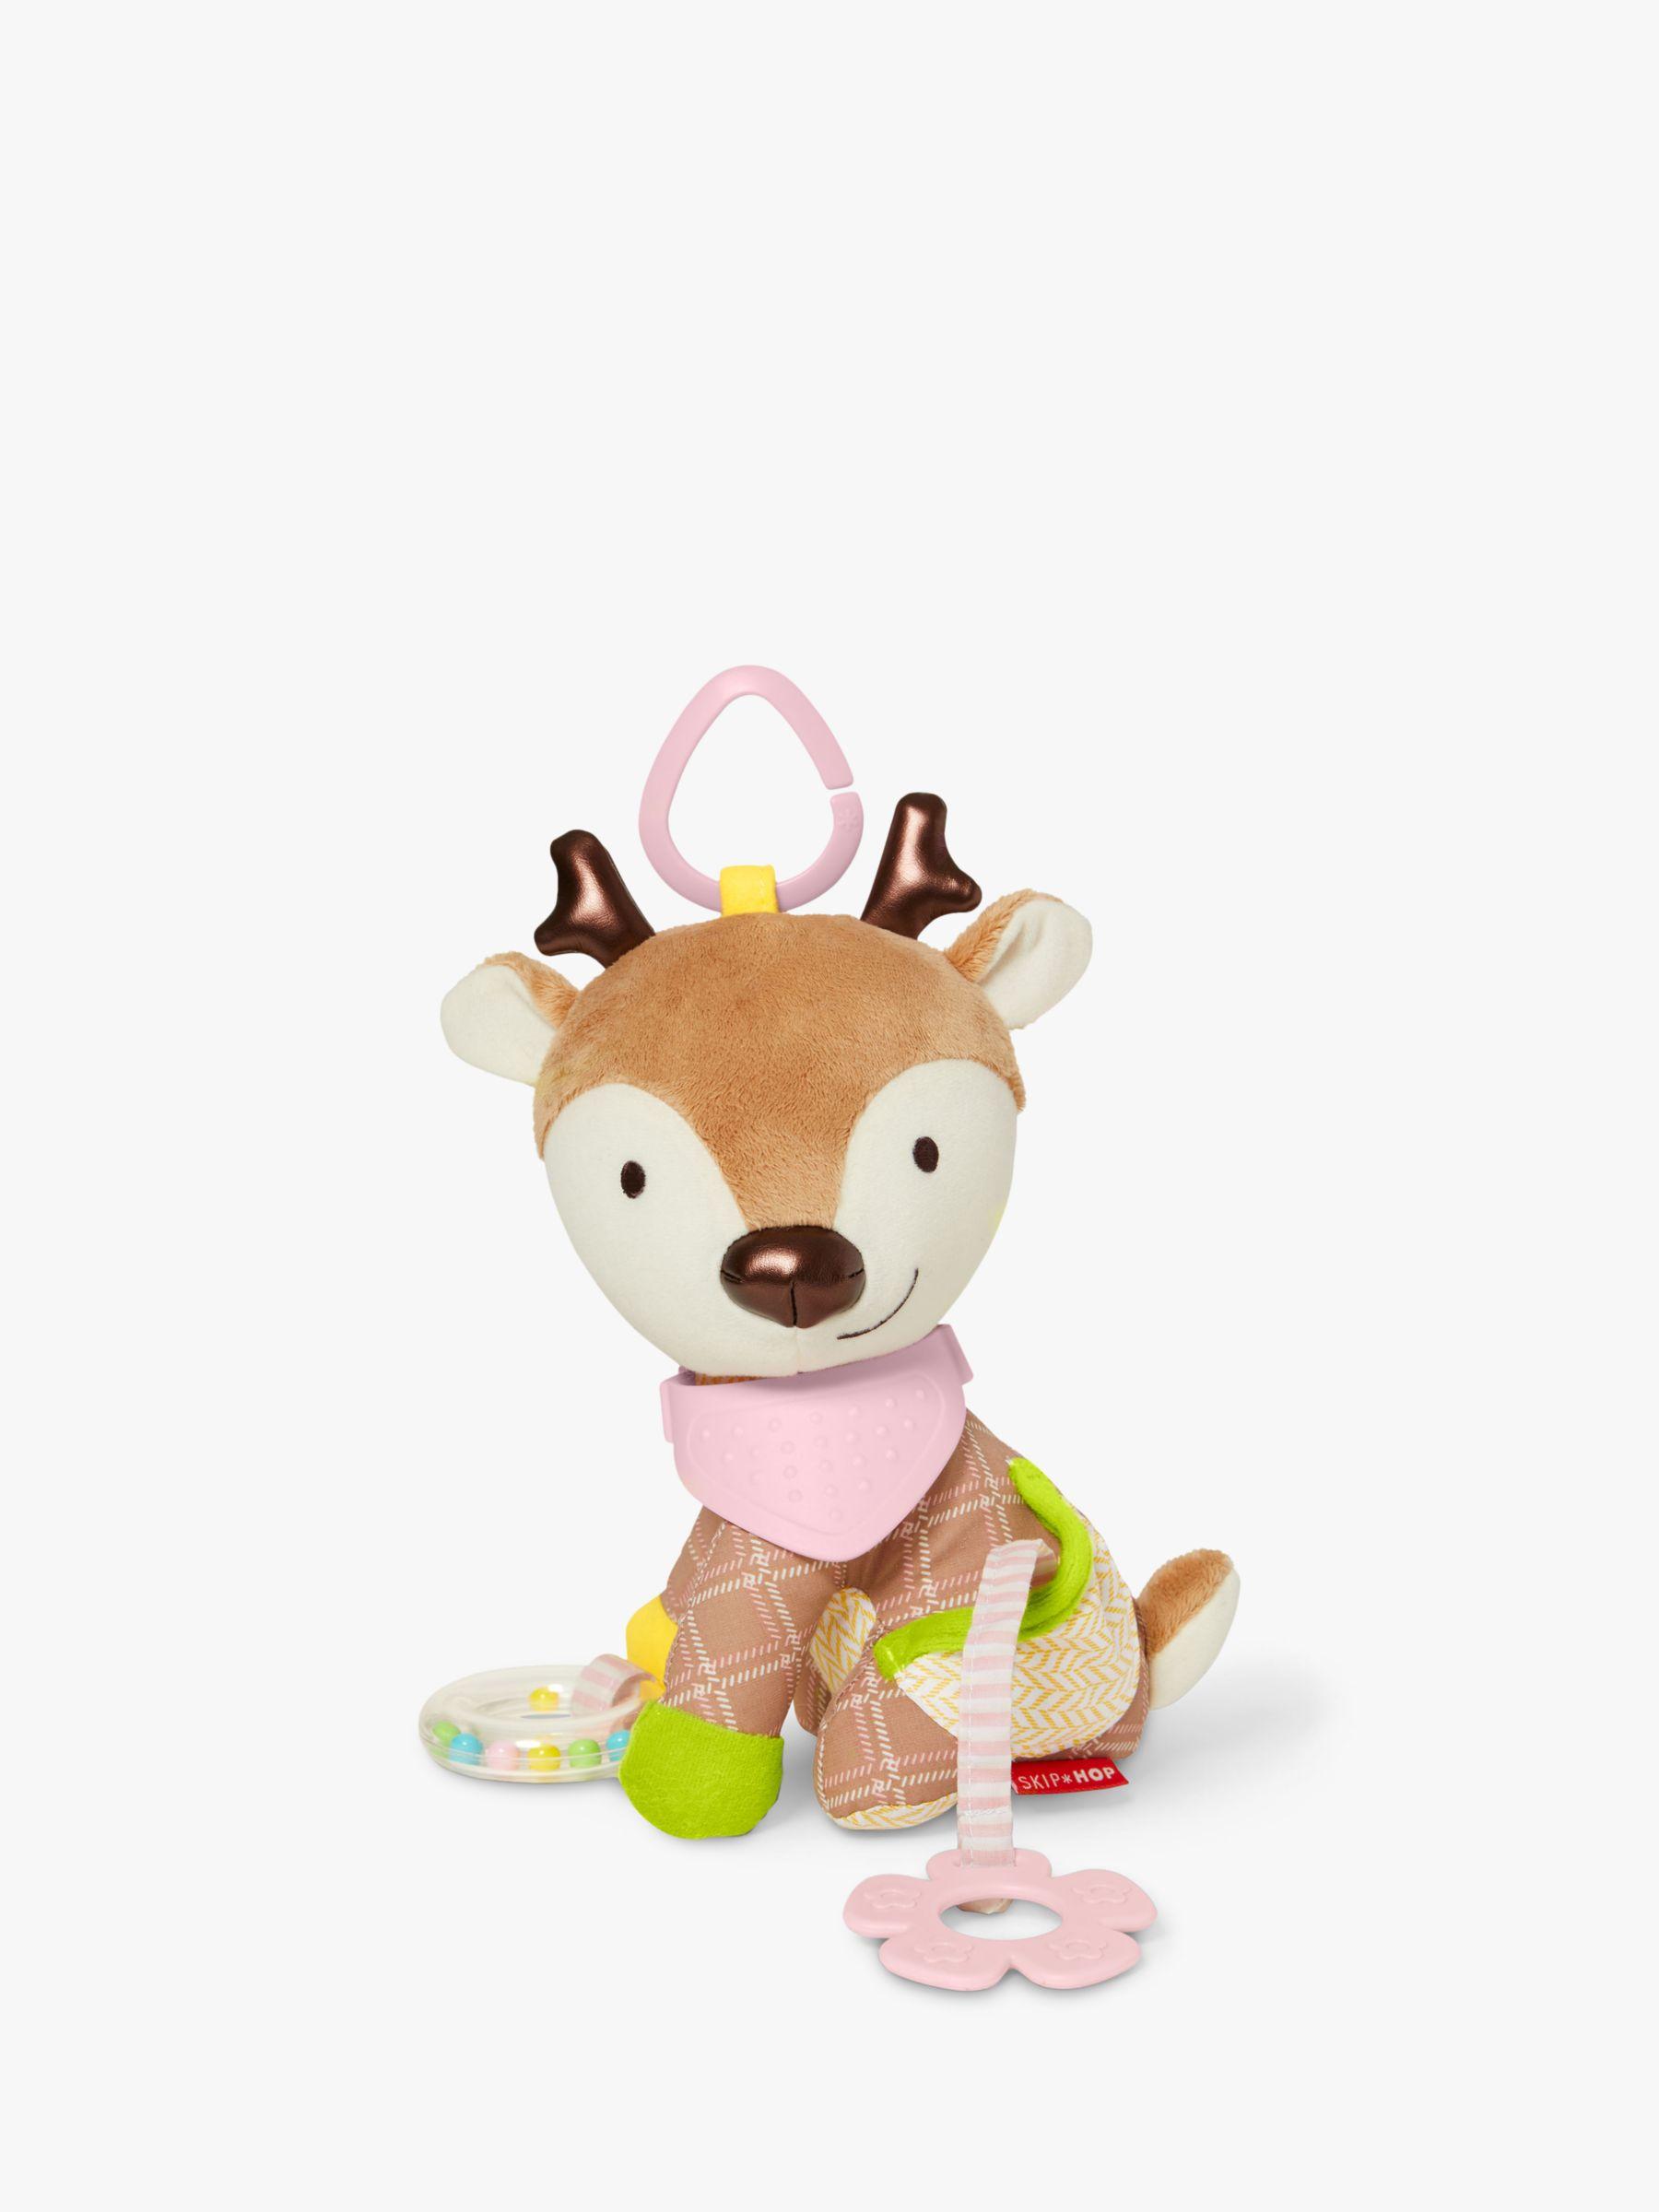 Skip Hop Skip Hop Bandana Buddies, Deer